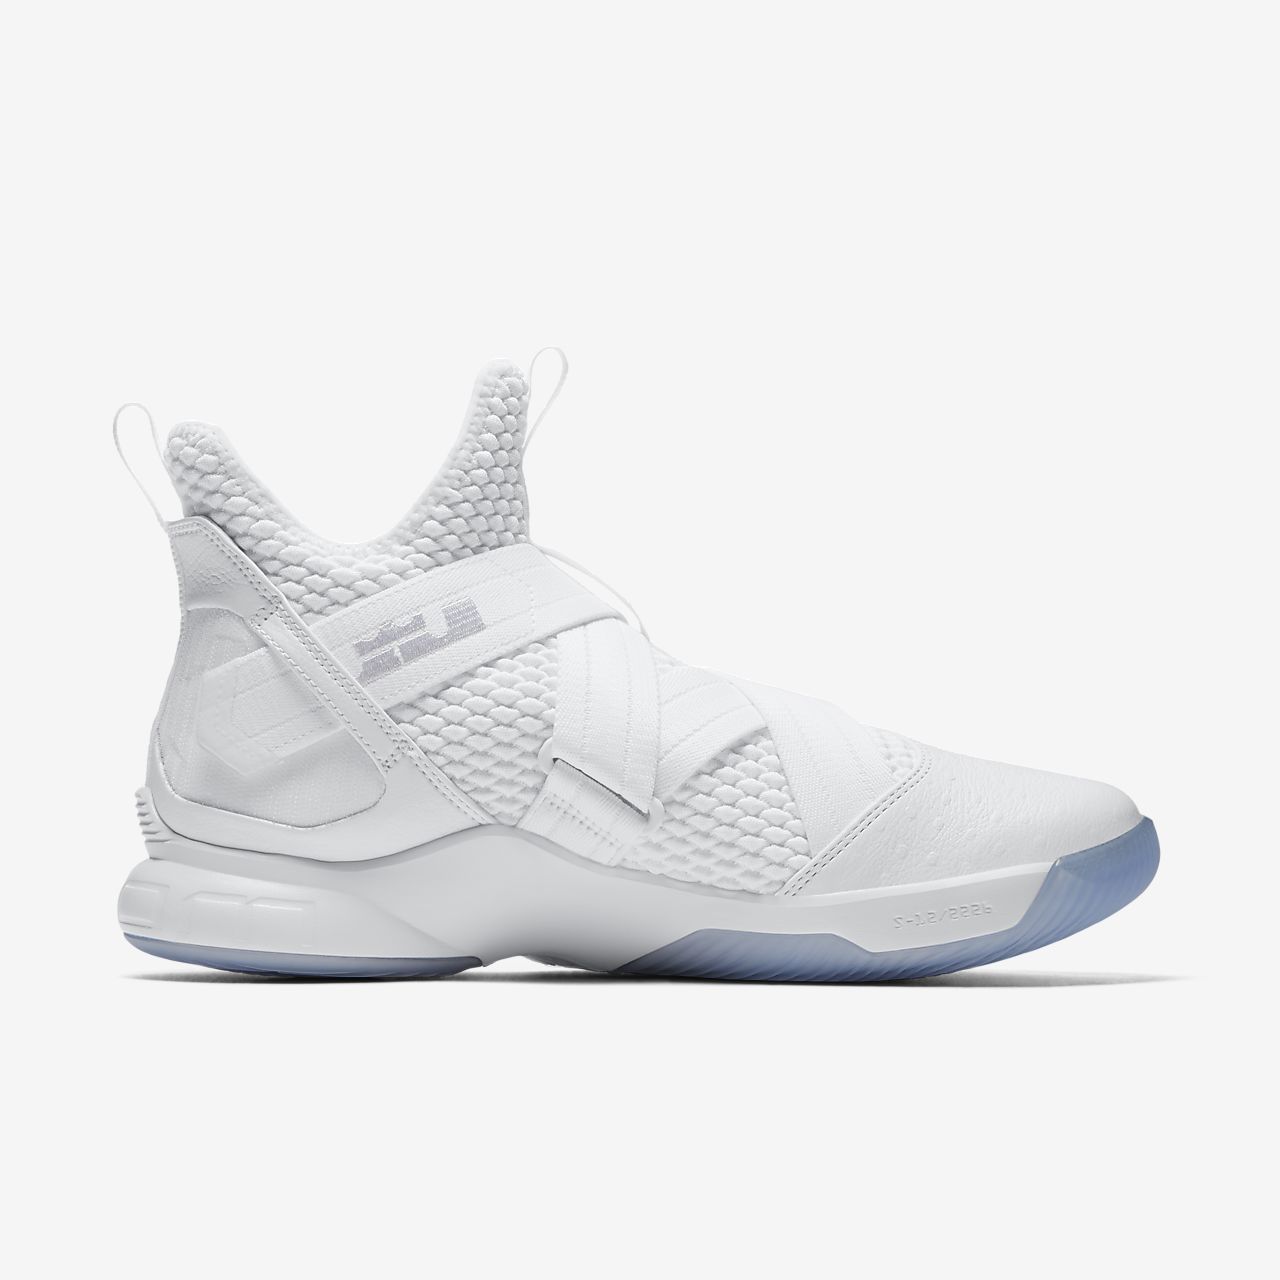 66c656bd2aa LeBron Soldier 12 SFG Basketball Shoe. Nike.com NL